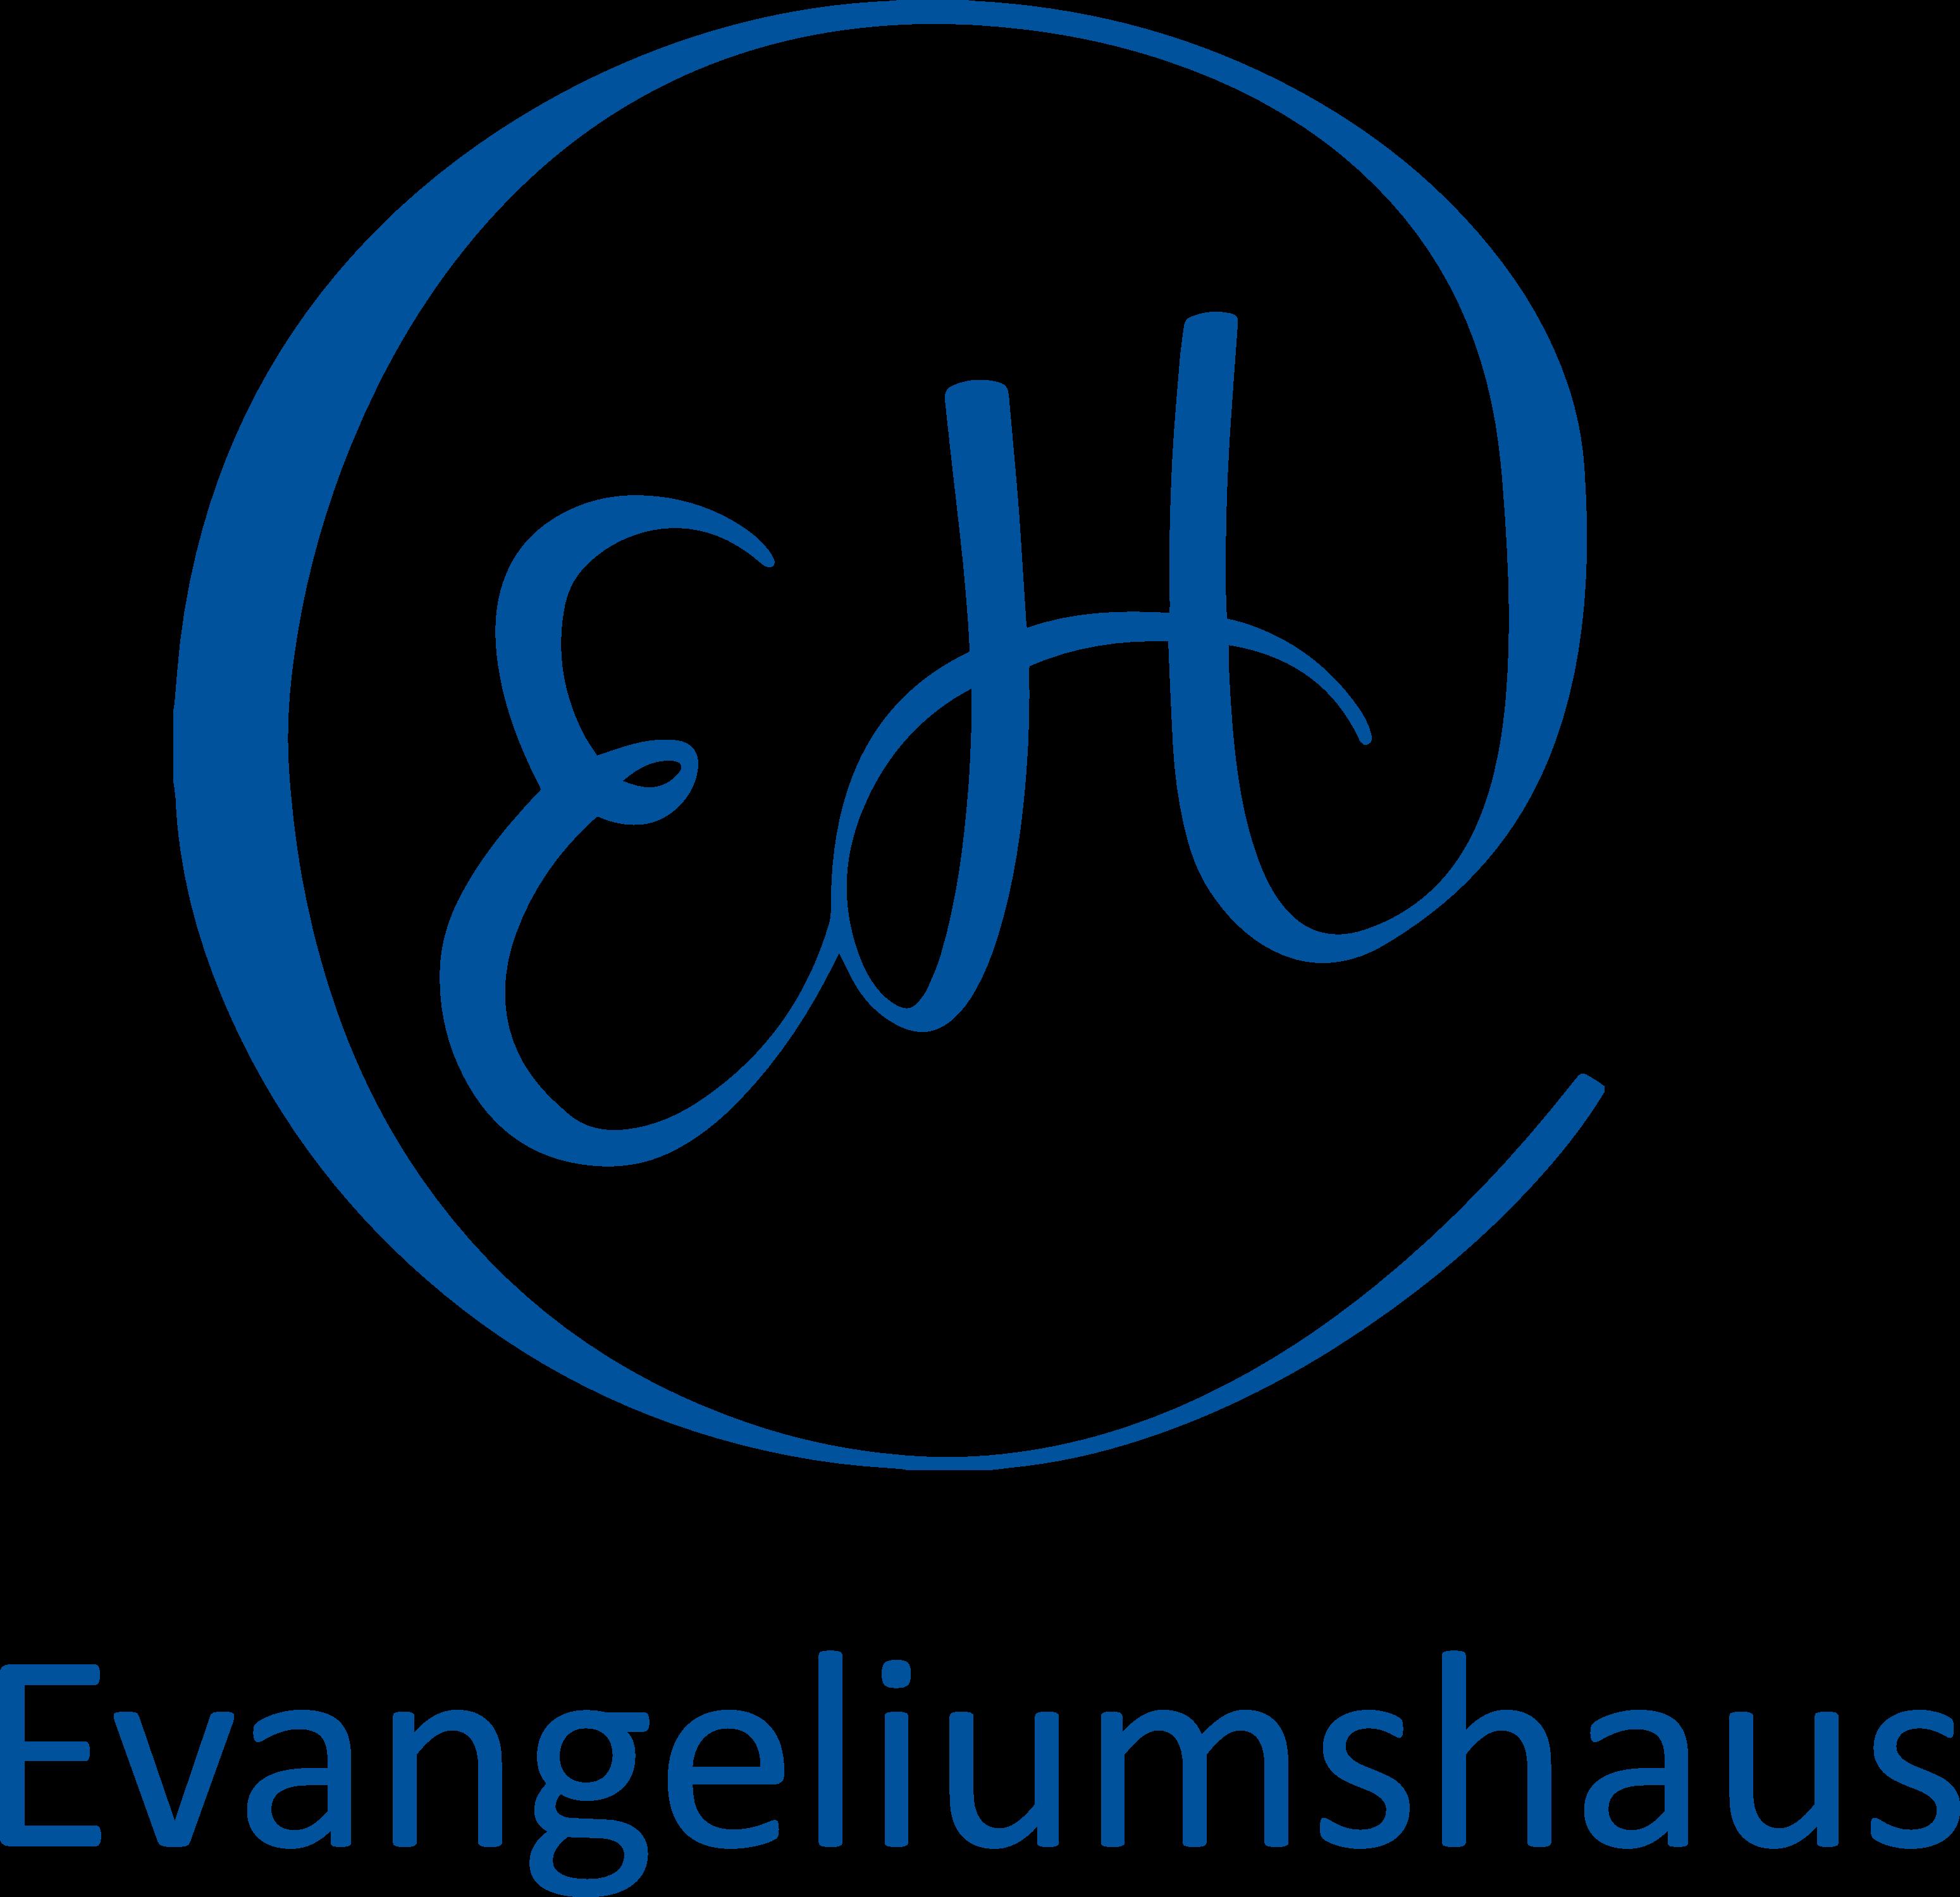 Evangeliumshaus